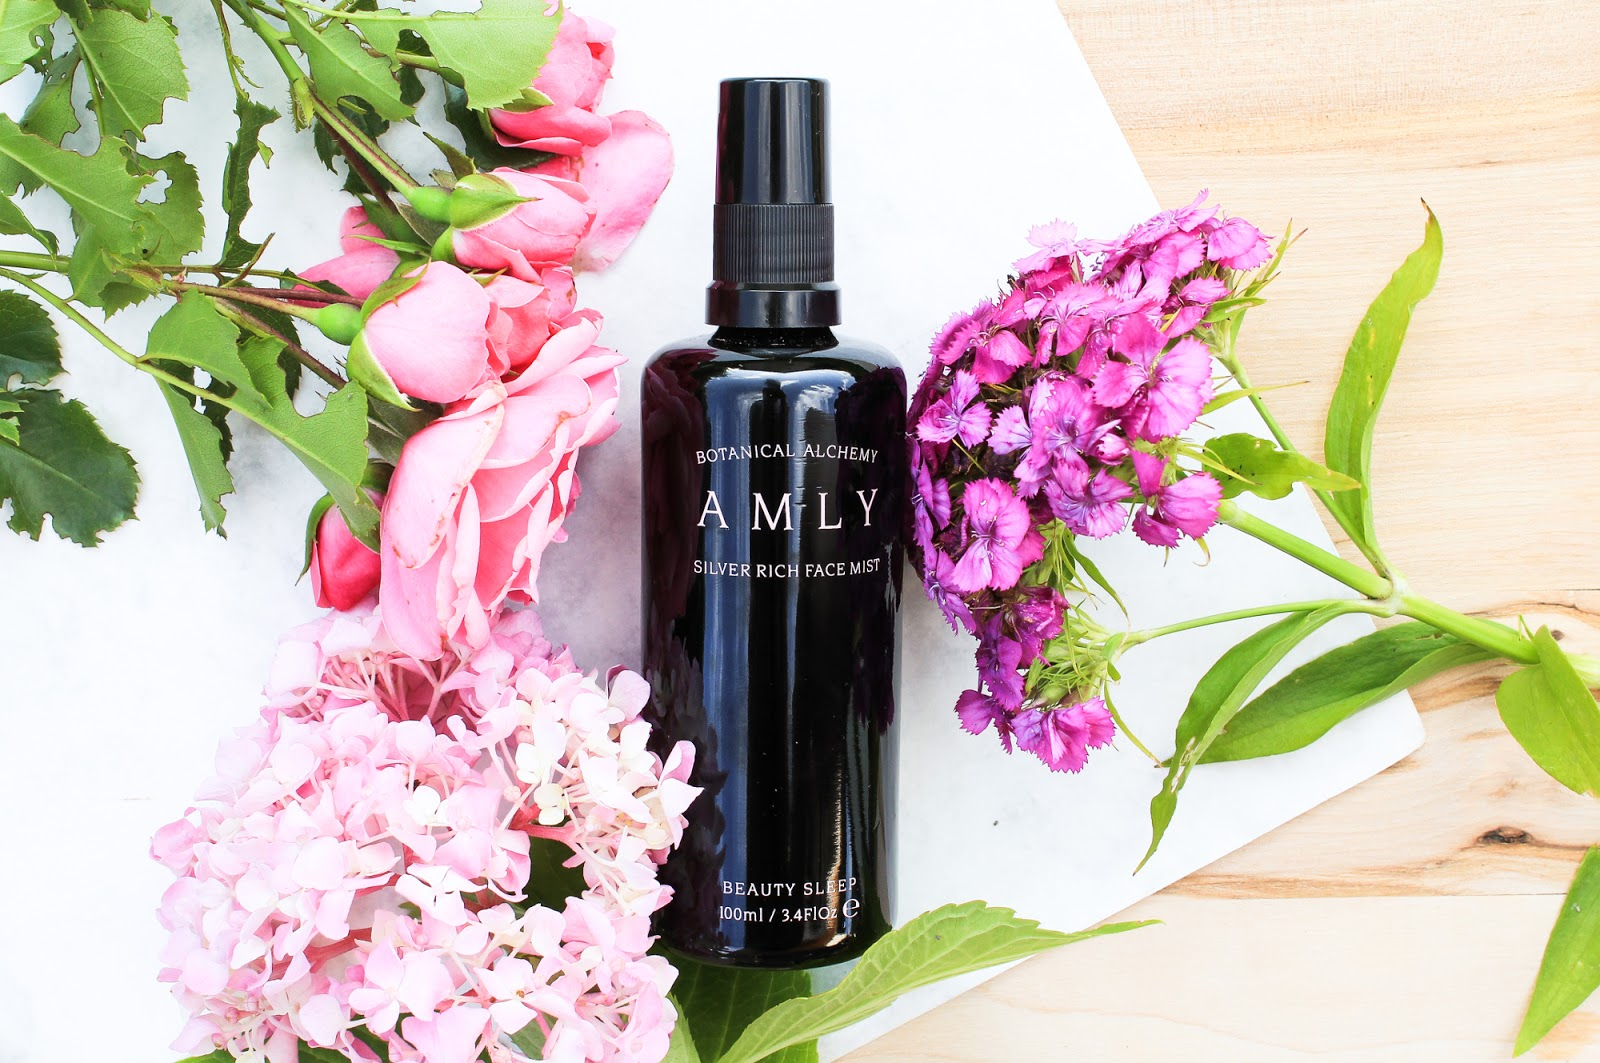 Amly Botanicals Beauty Sleep Silver Rich Face Mist, Boxwalla beauty box